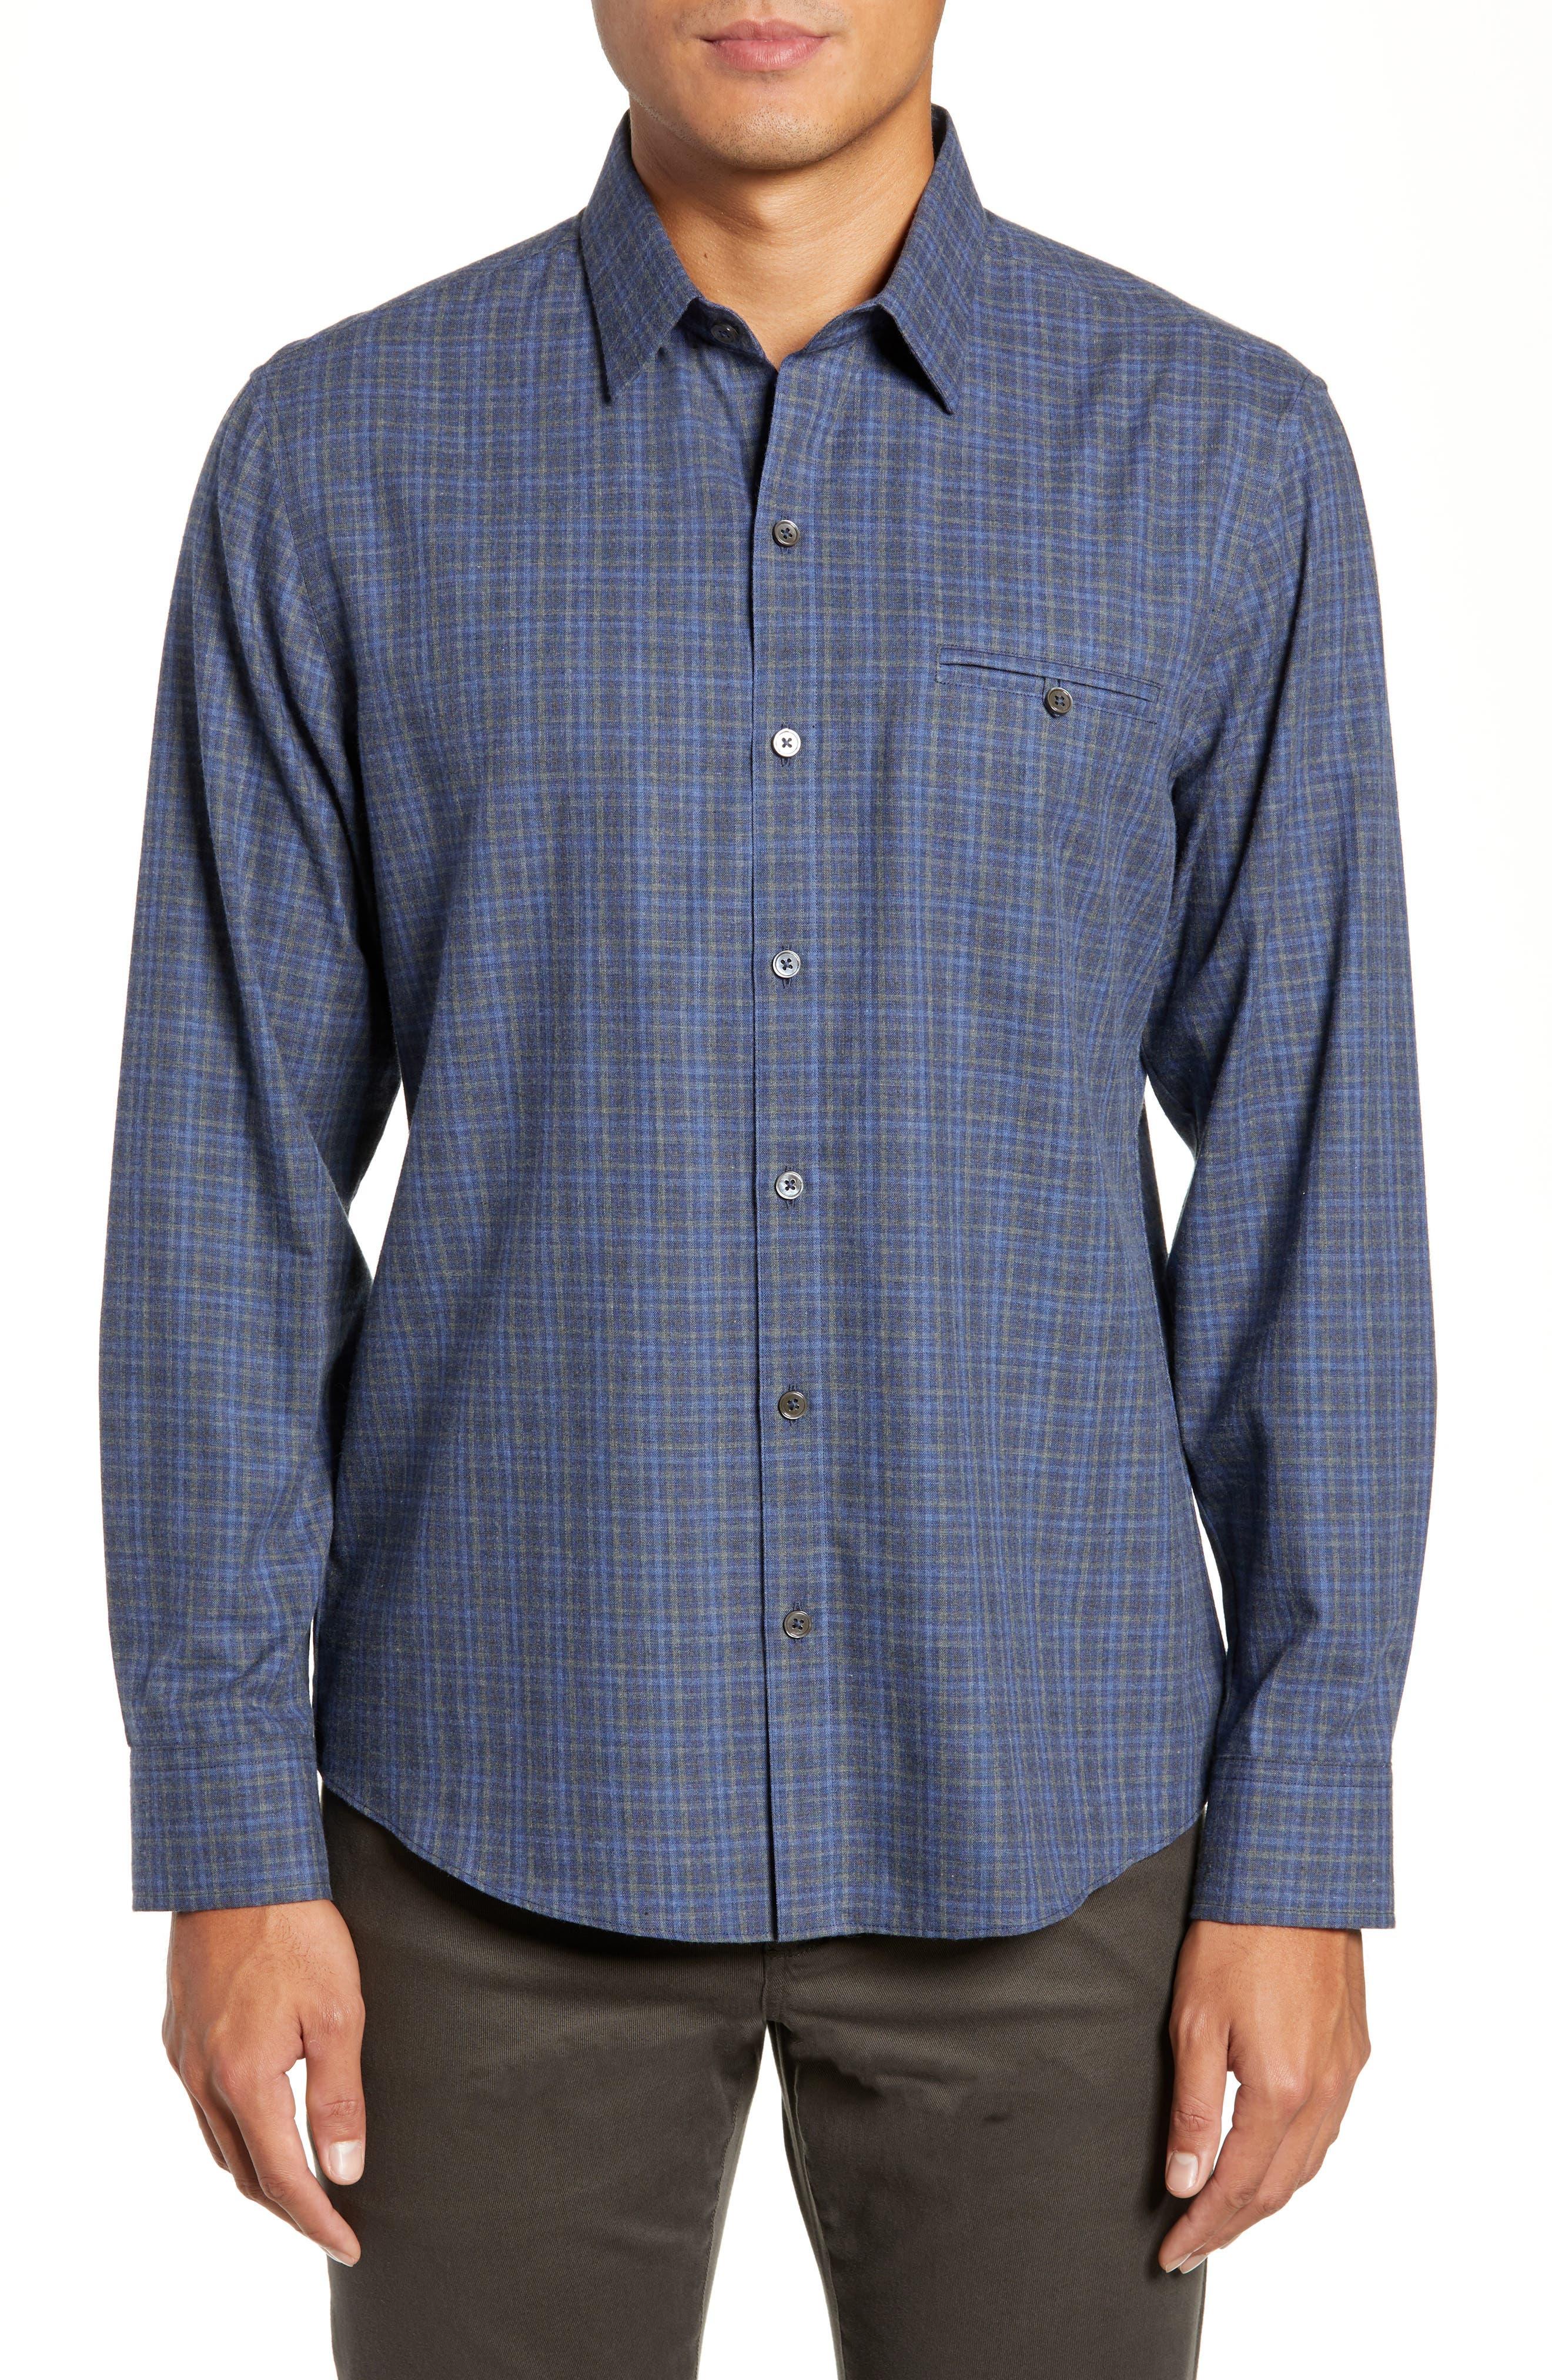 Nguyen Regular Fit Sport Shirt,                             Main thumbnail 1, color,                             DARK BLUE